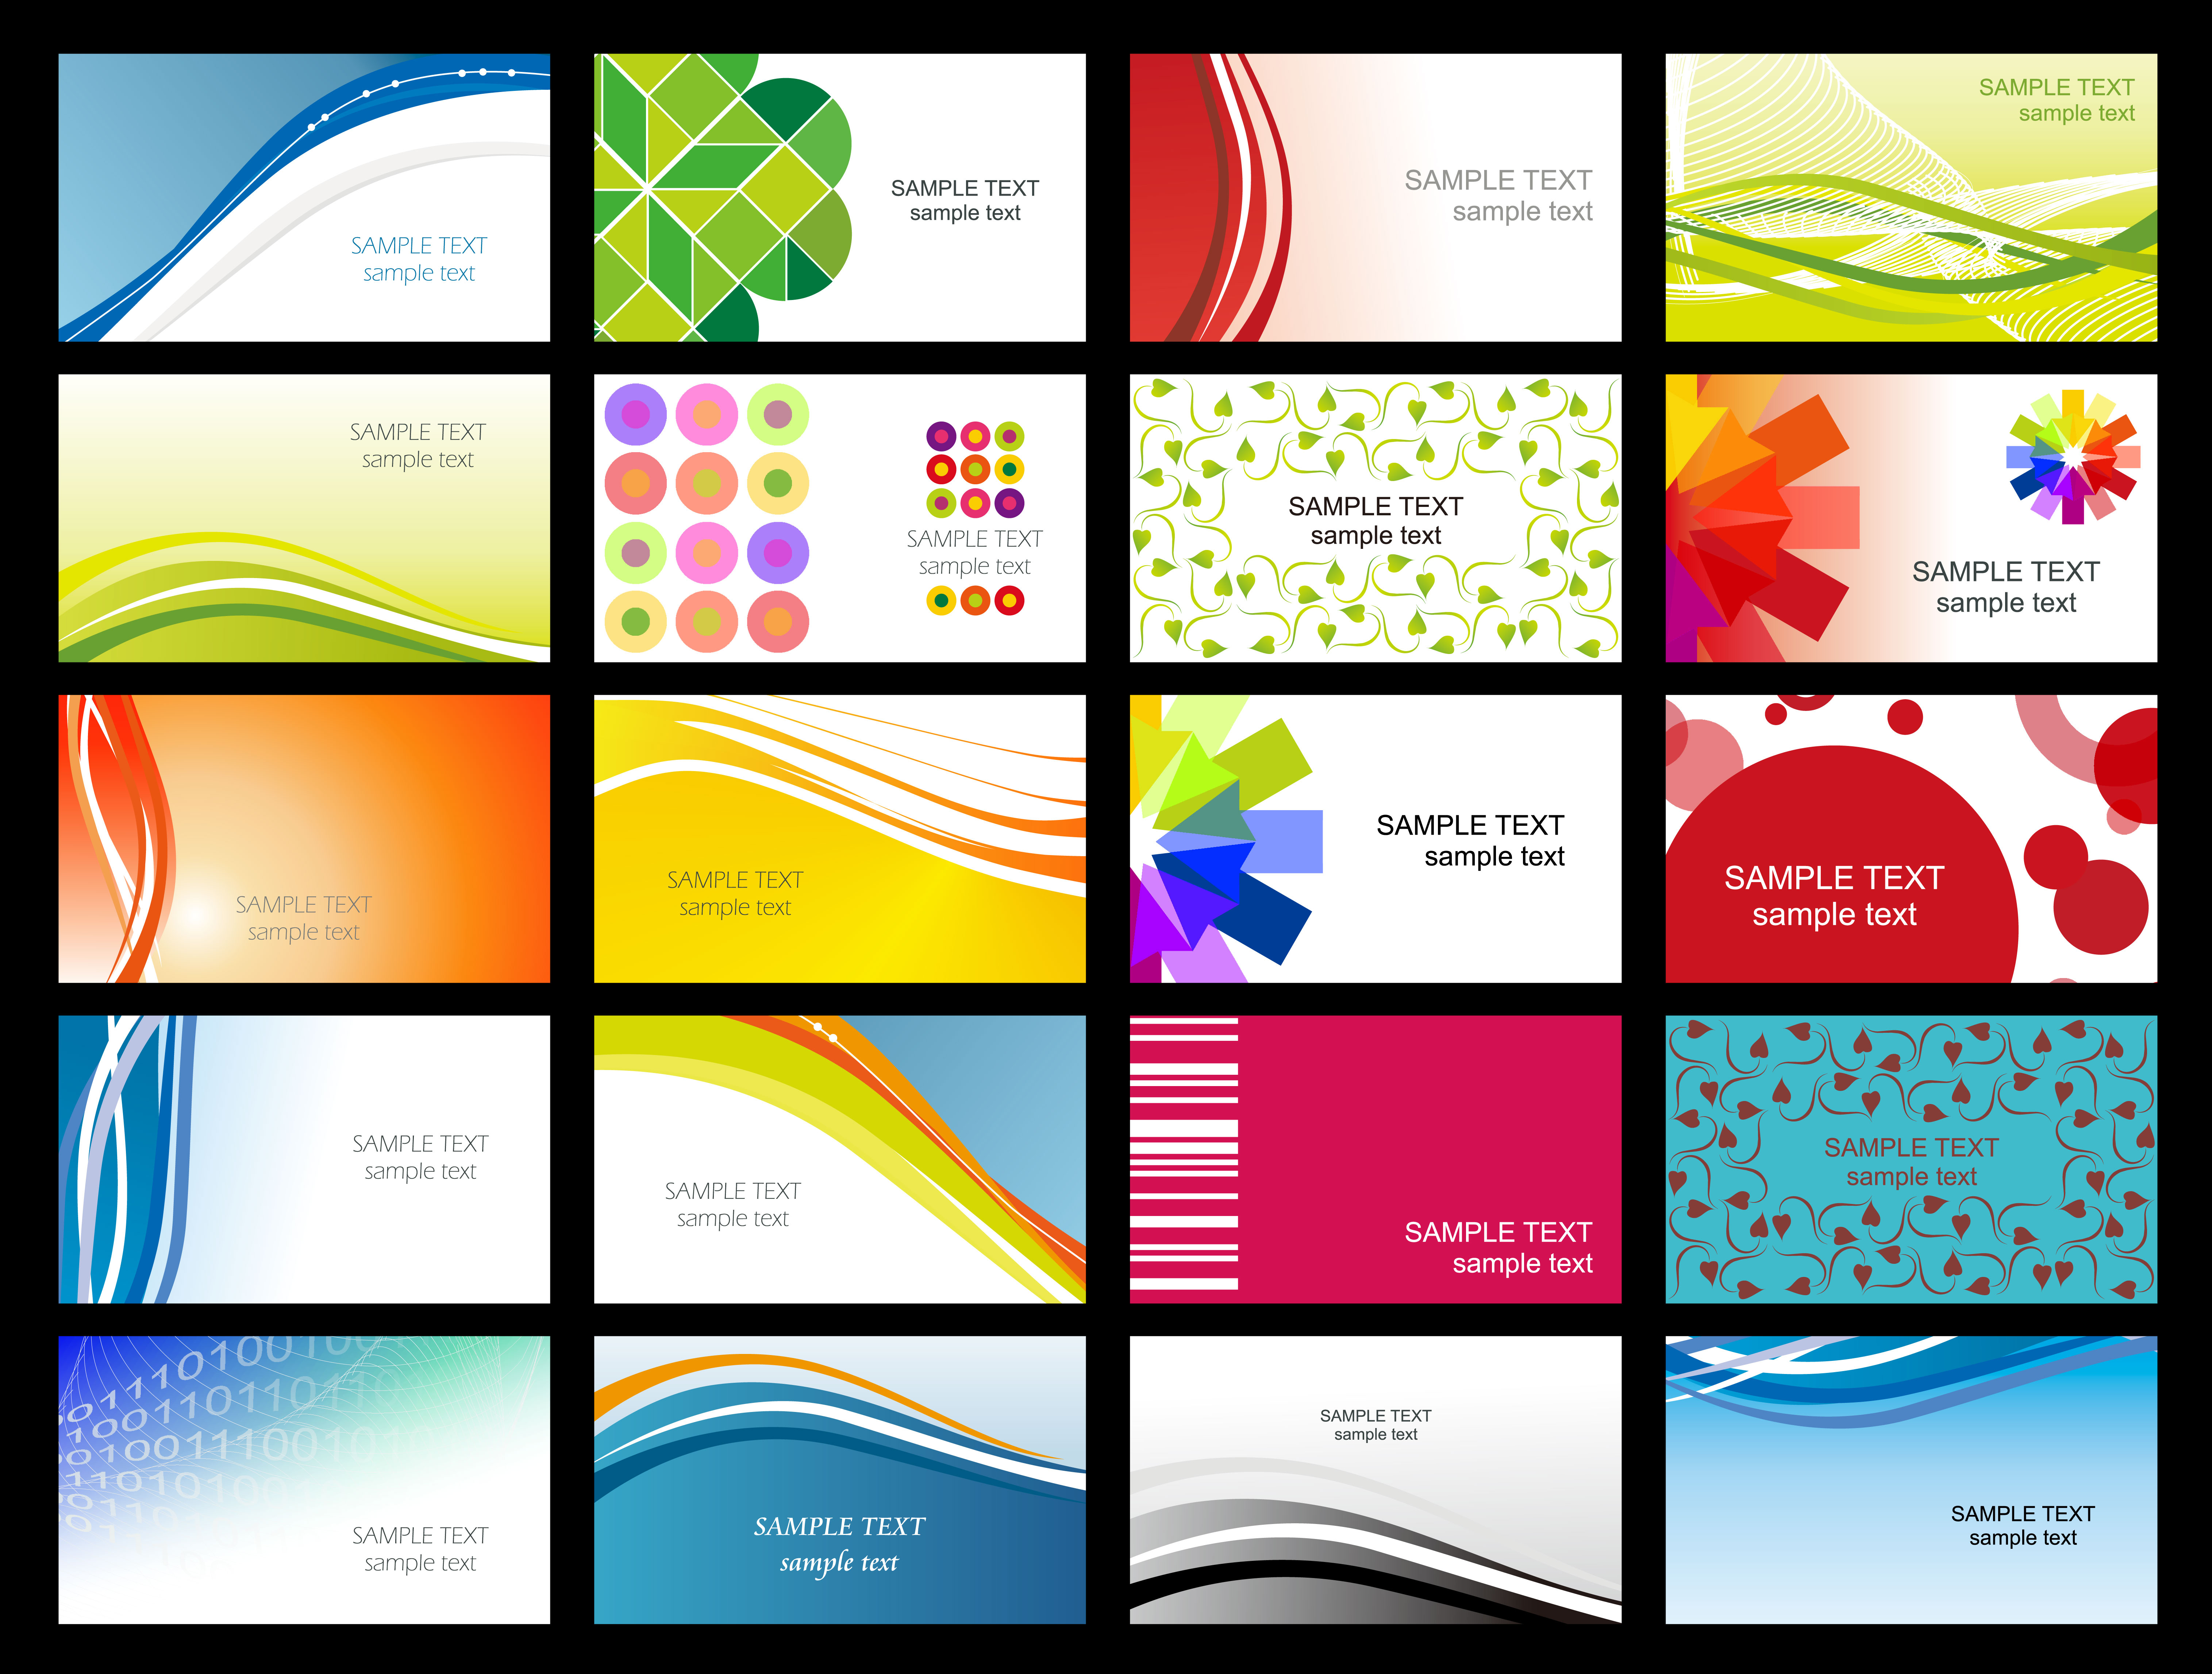 Free Printable Business Card Templates Sample | Get Sniffer - Free Printable Business Card Templates